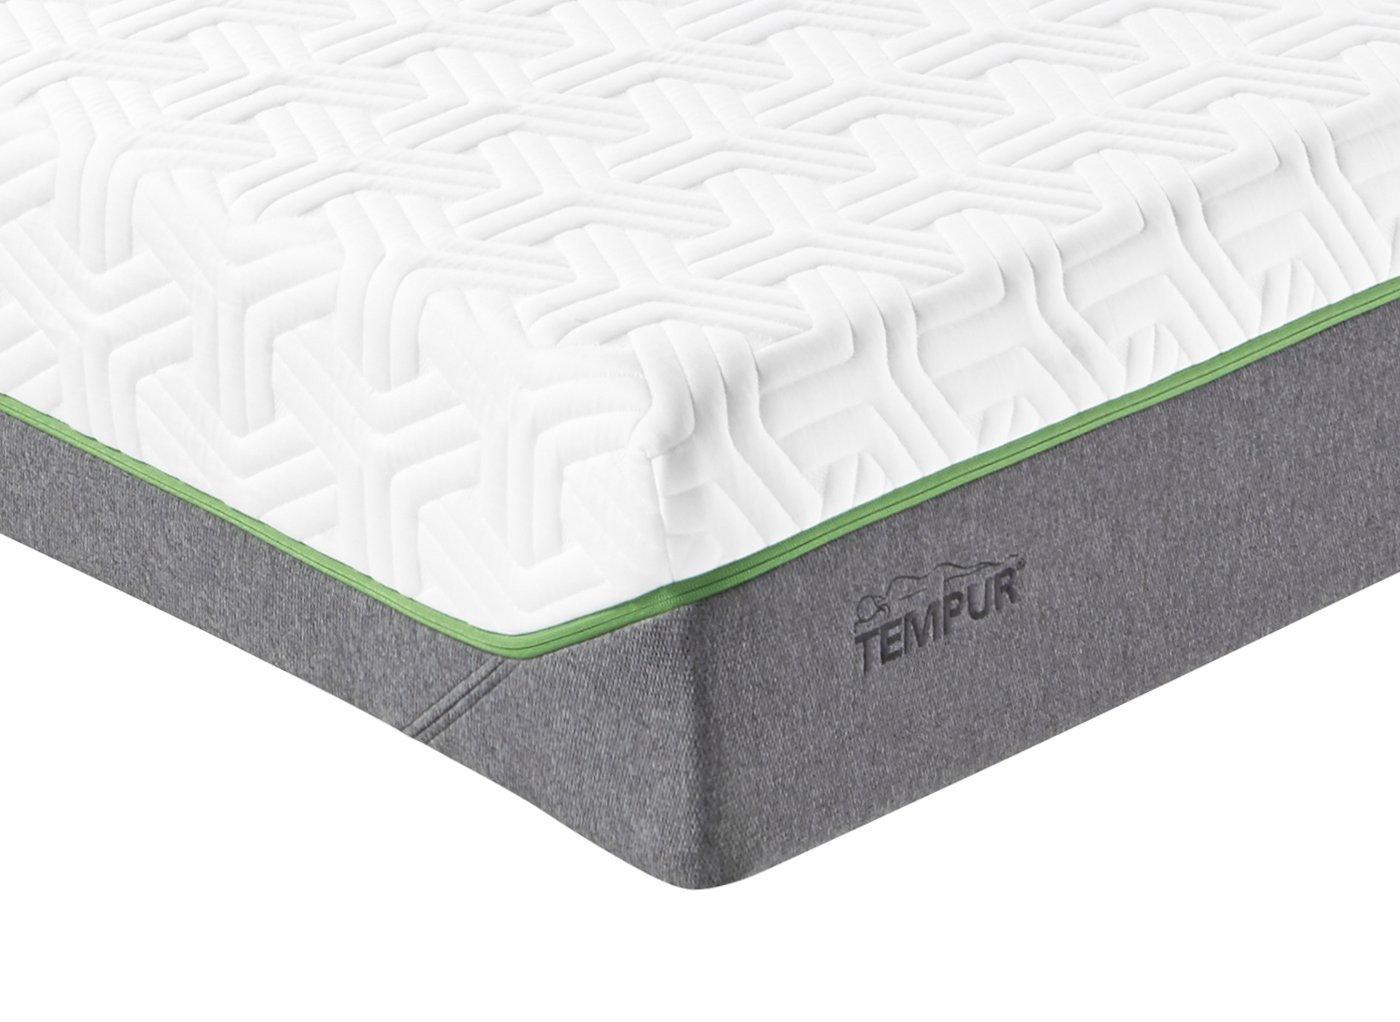 Tempur Cooltouch Hybrid Elite Adjustable Mattress - Medium 4'0 Small double